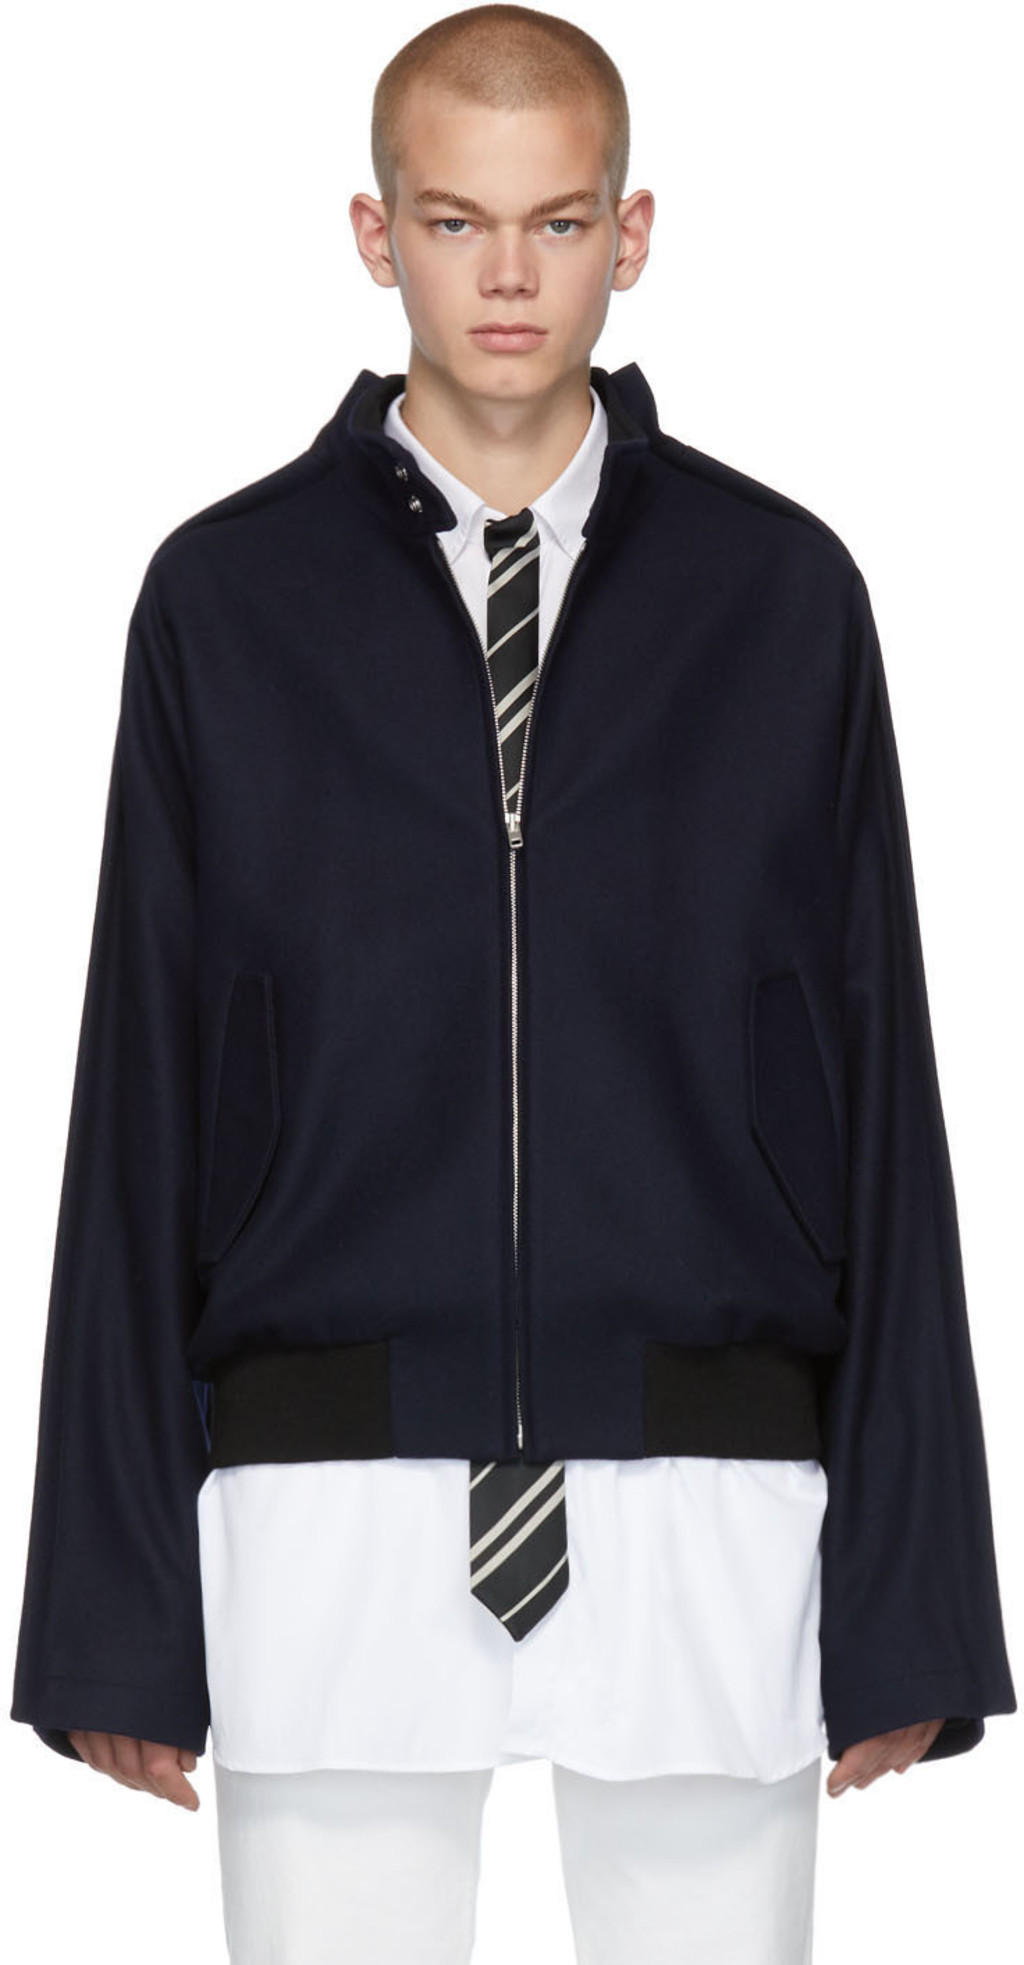 b42e27bc8 Blue Wool Traditional Jacket